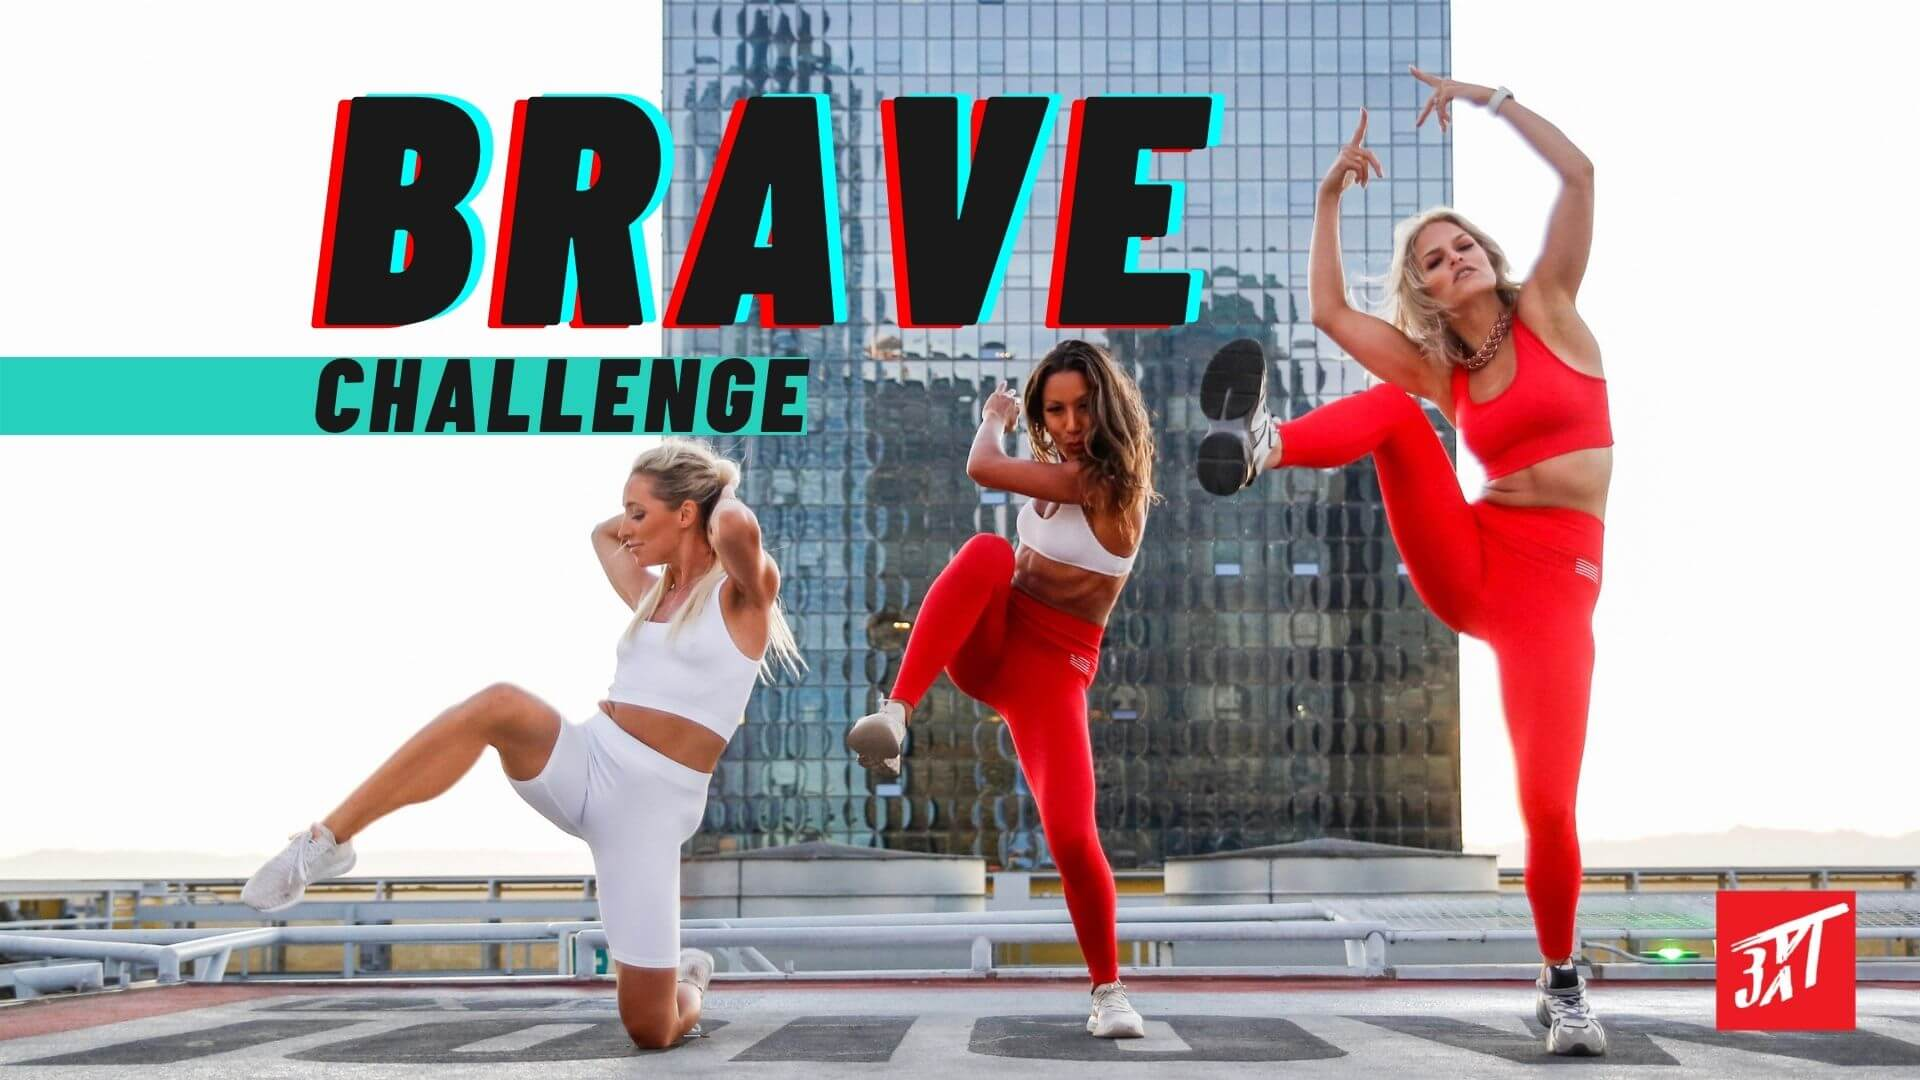 brave challenge by 3XT